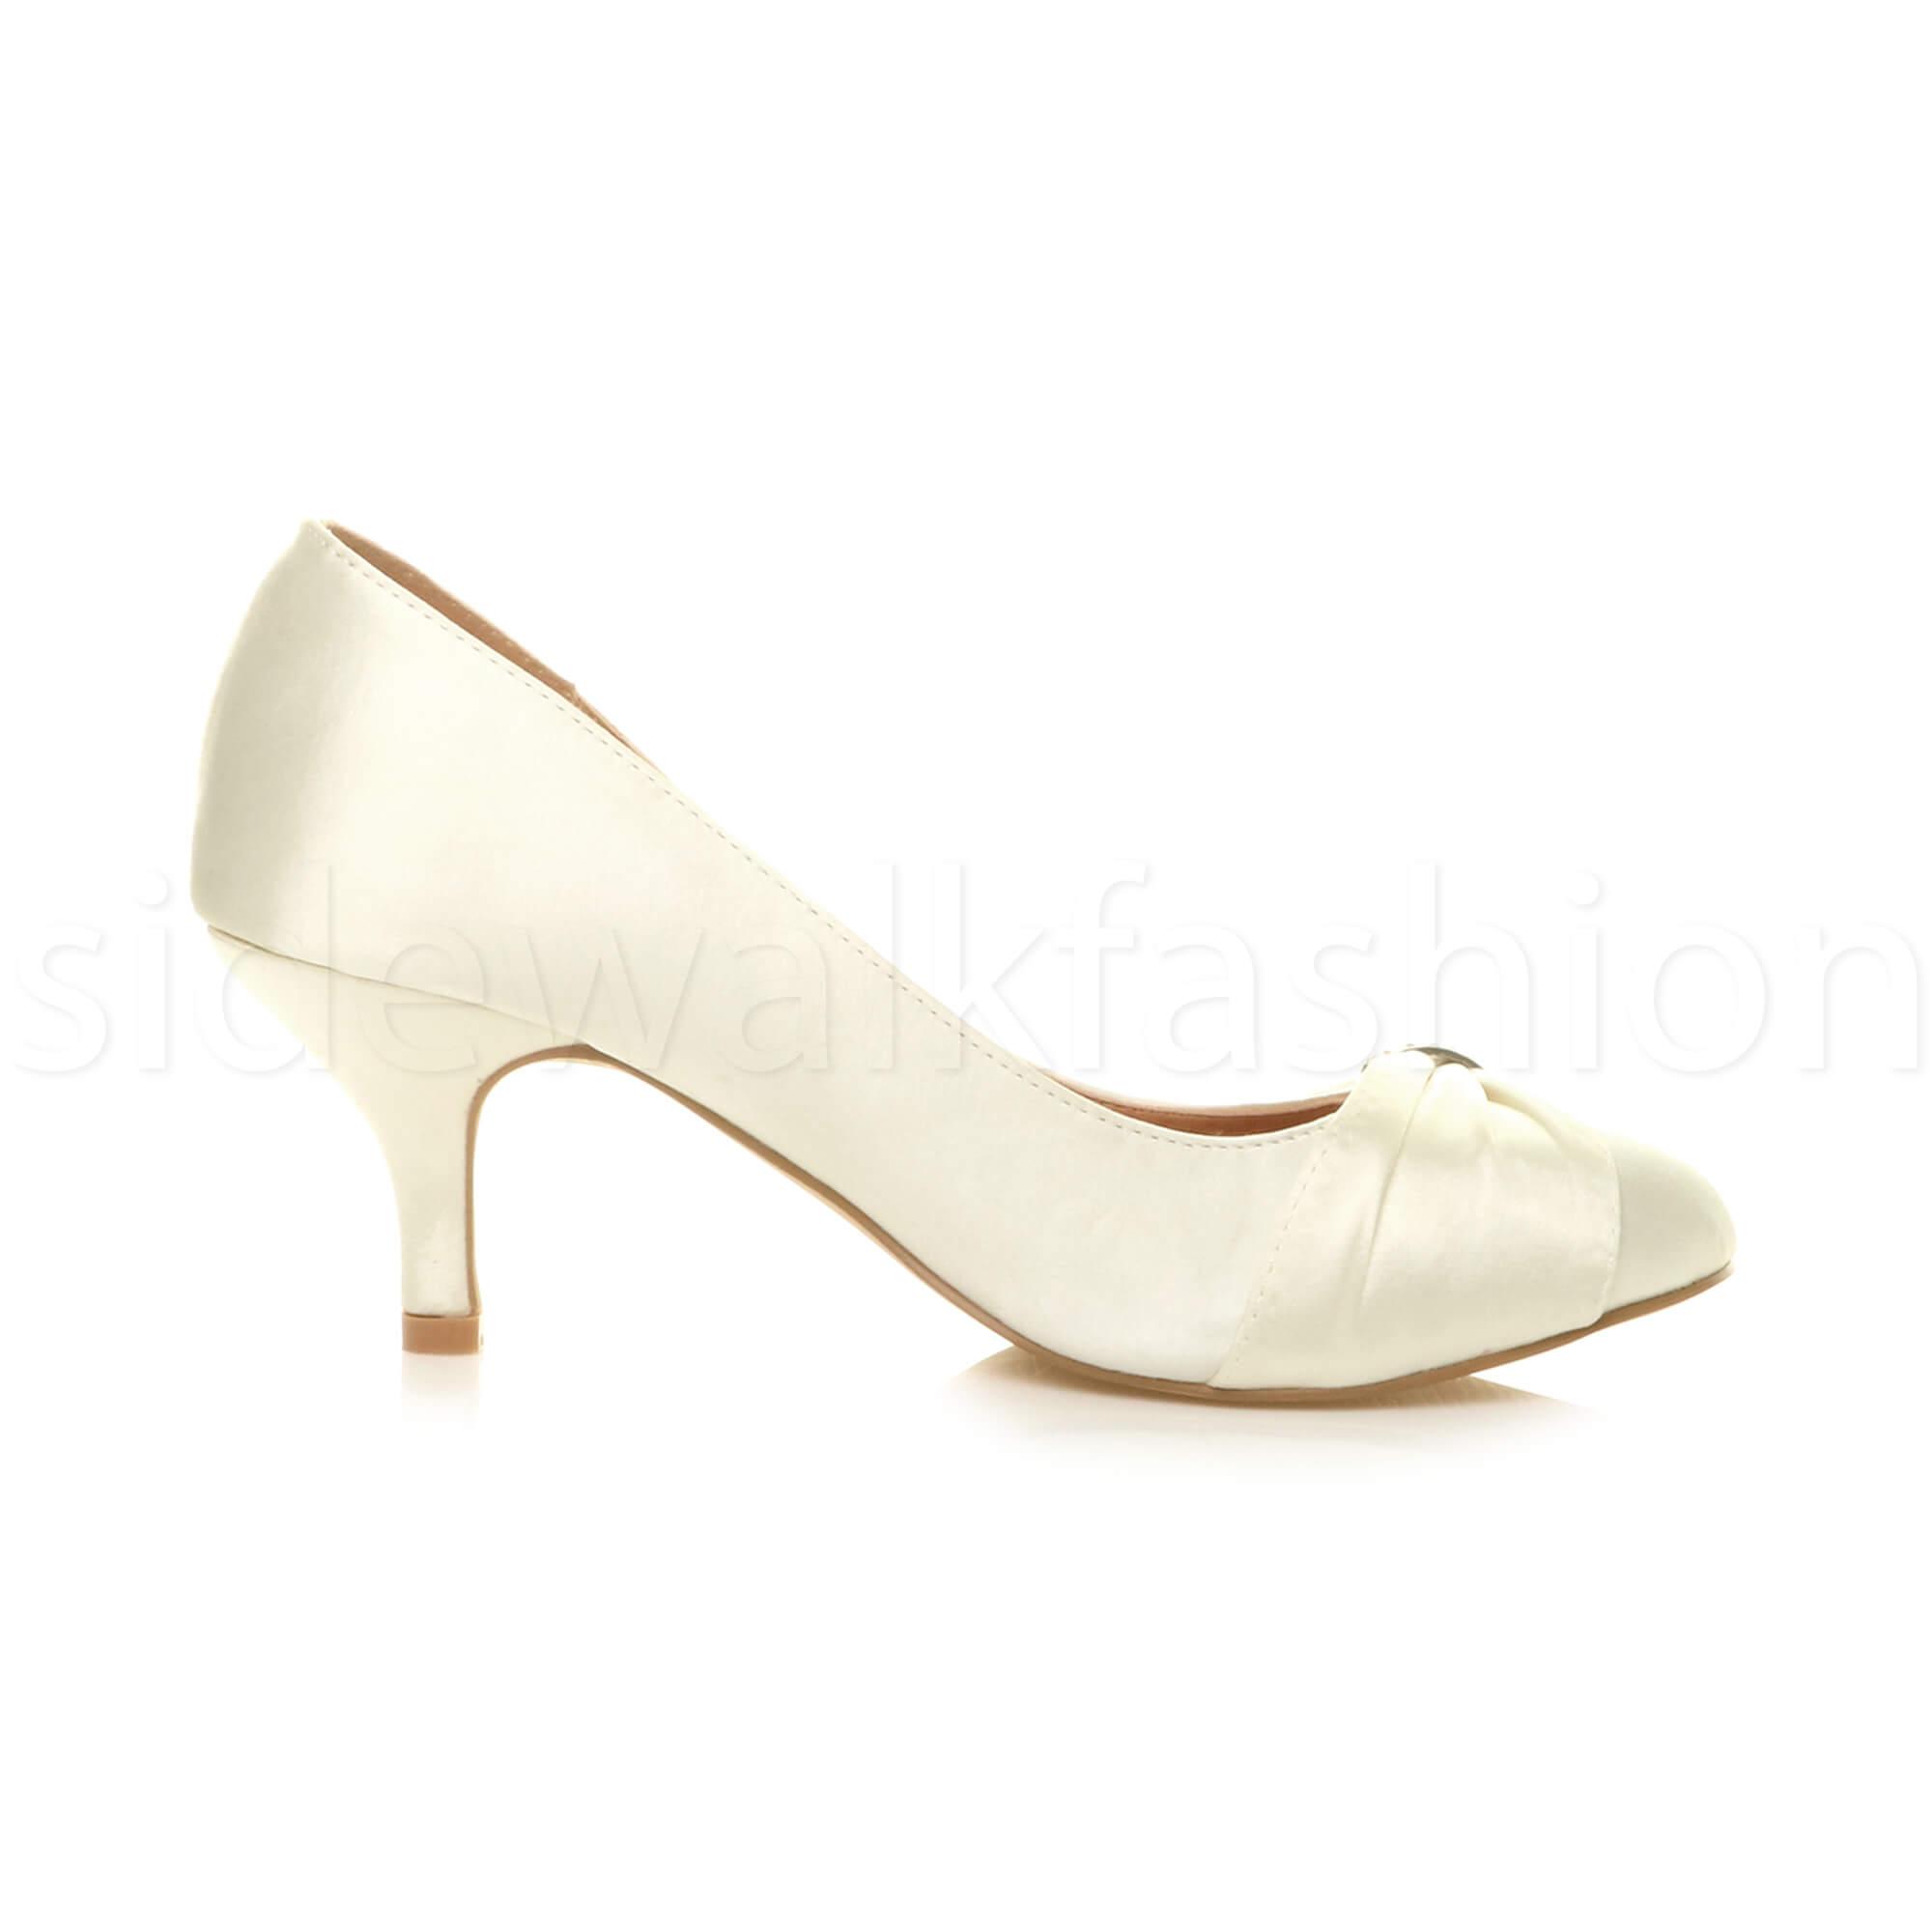 Womens-ladies-low-mid-heel-diamante-party-smart-evening-court-shoes-size thumbnail 36